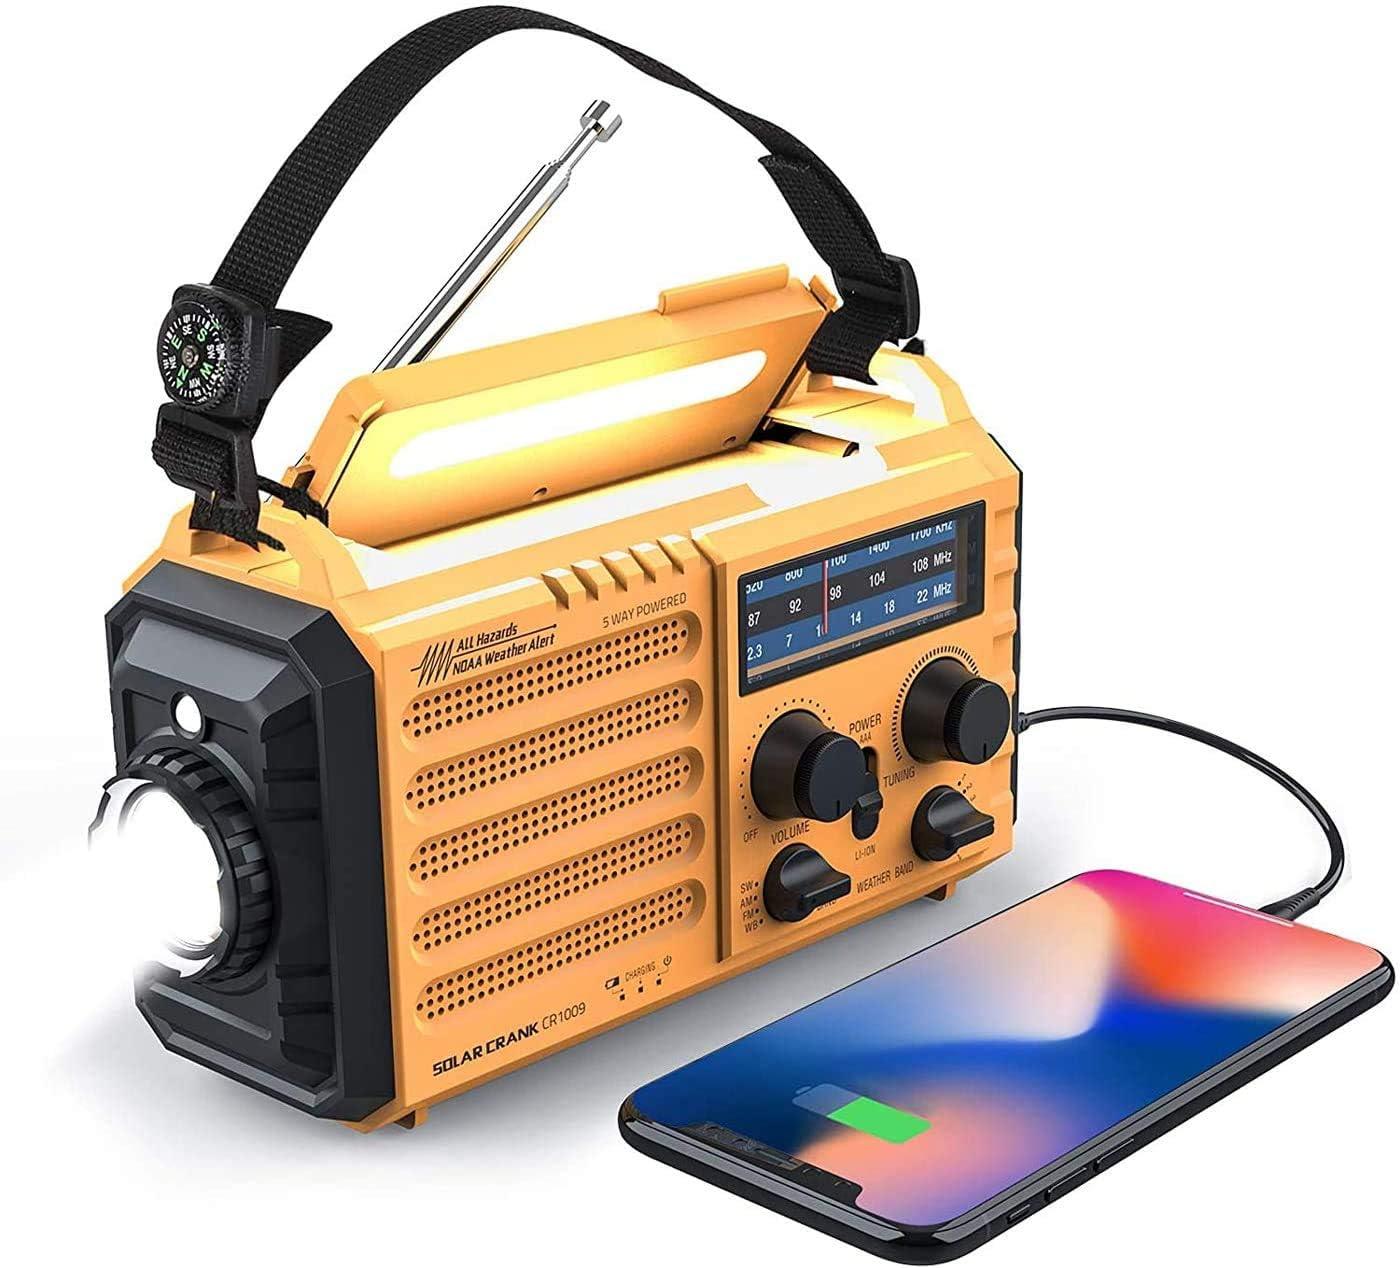 Weather Radio Raynic 5000mAh Solar Hand Crank Emergency Radio 5 Ways Powered AM/FM/SW/NOAA Weather Alert Portable Radio with Flashlight, Reading Lamp, Cellphone Charger and SOS Alarm (Yellow)